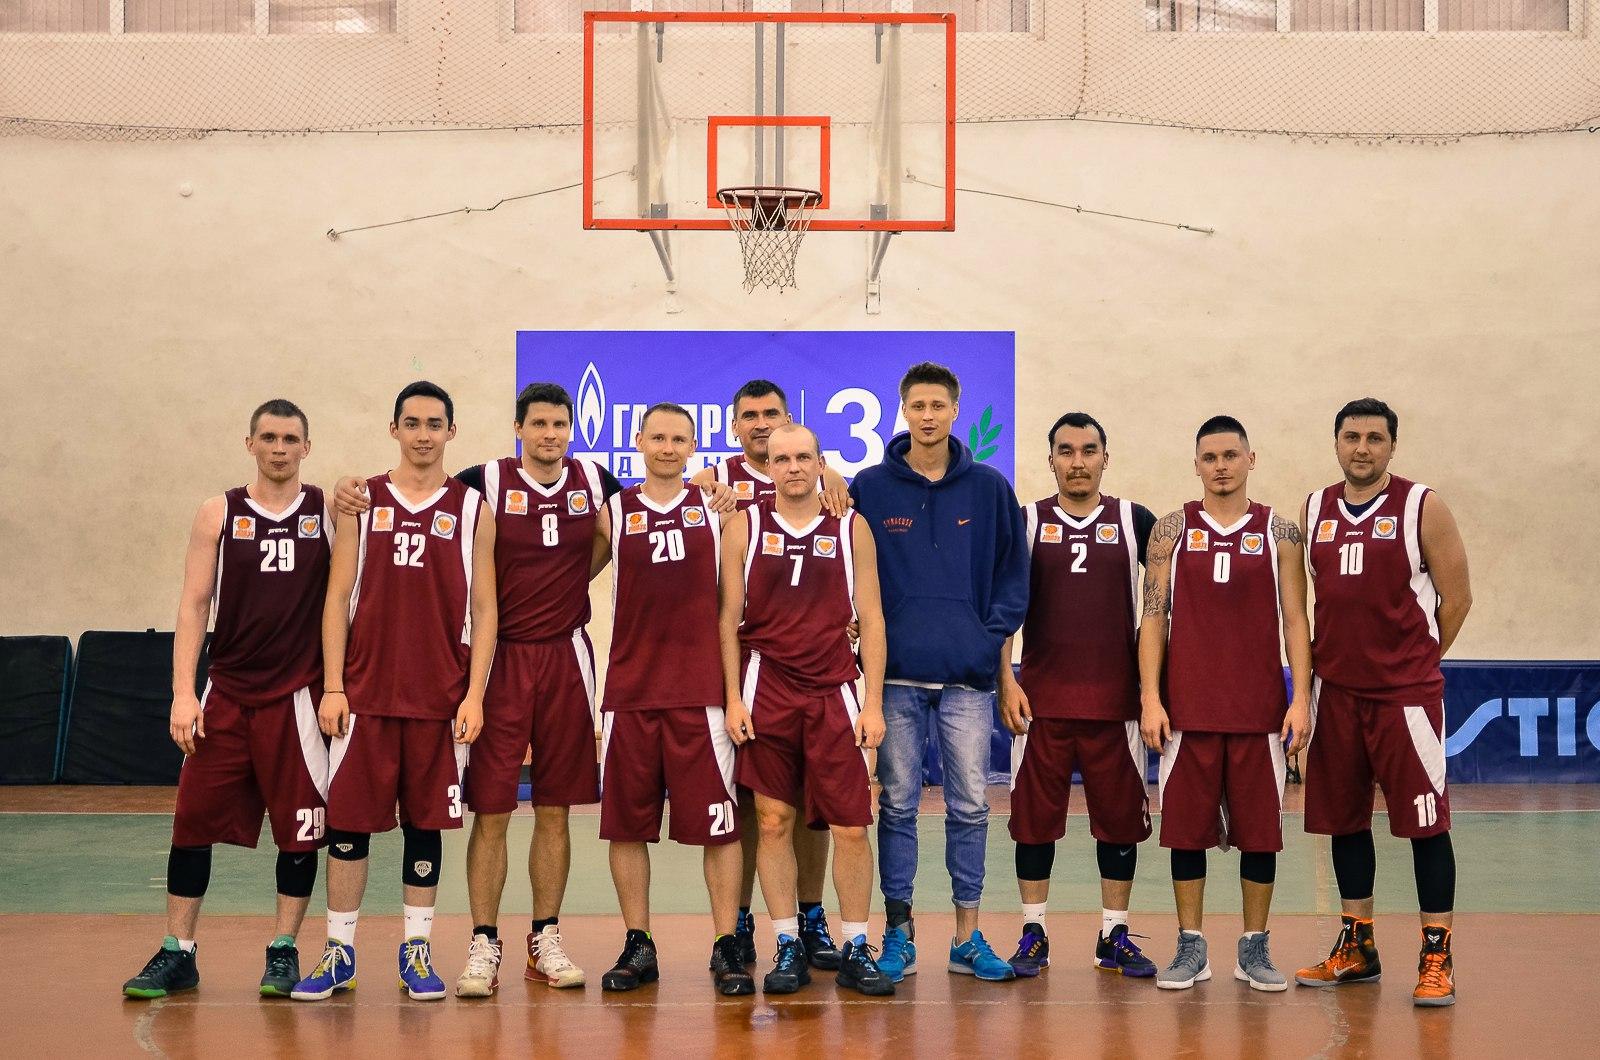 Факел-АГПЗ Астрахань баскетбол